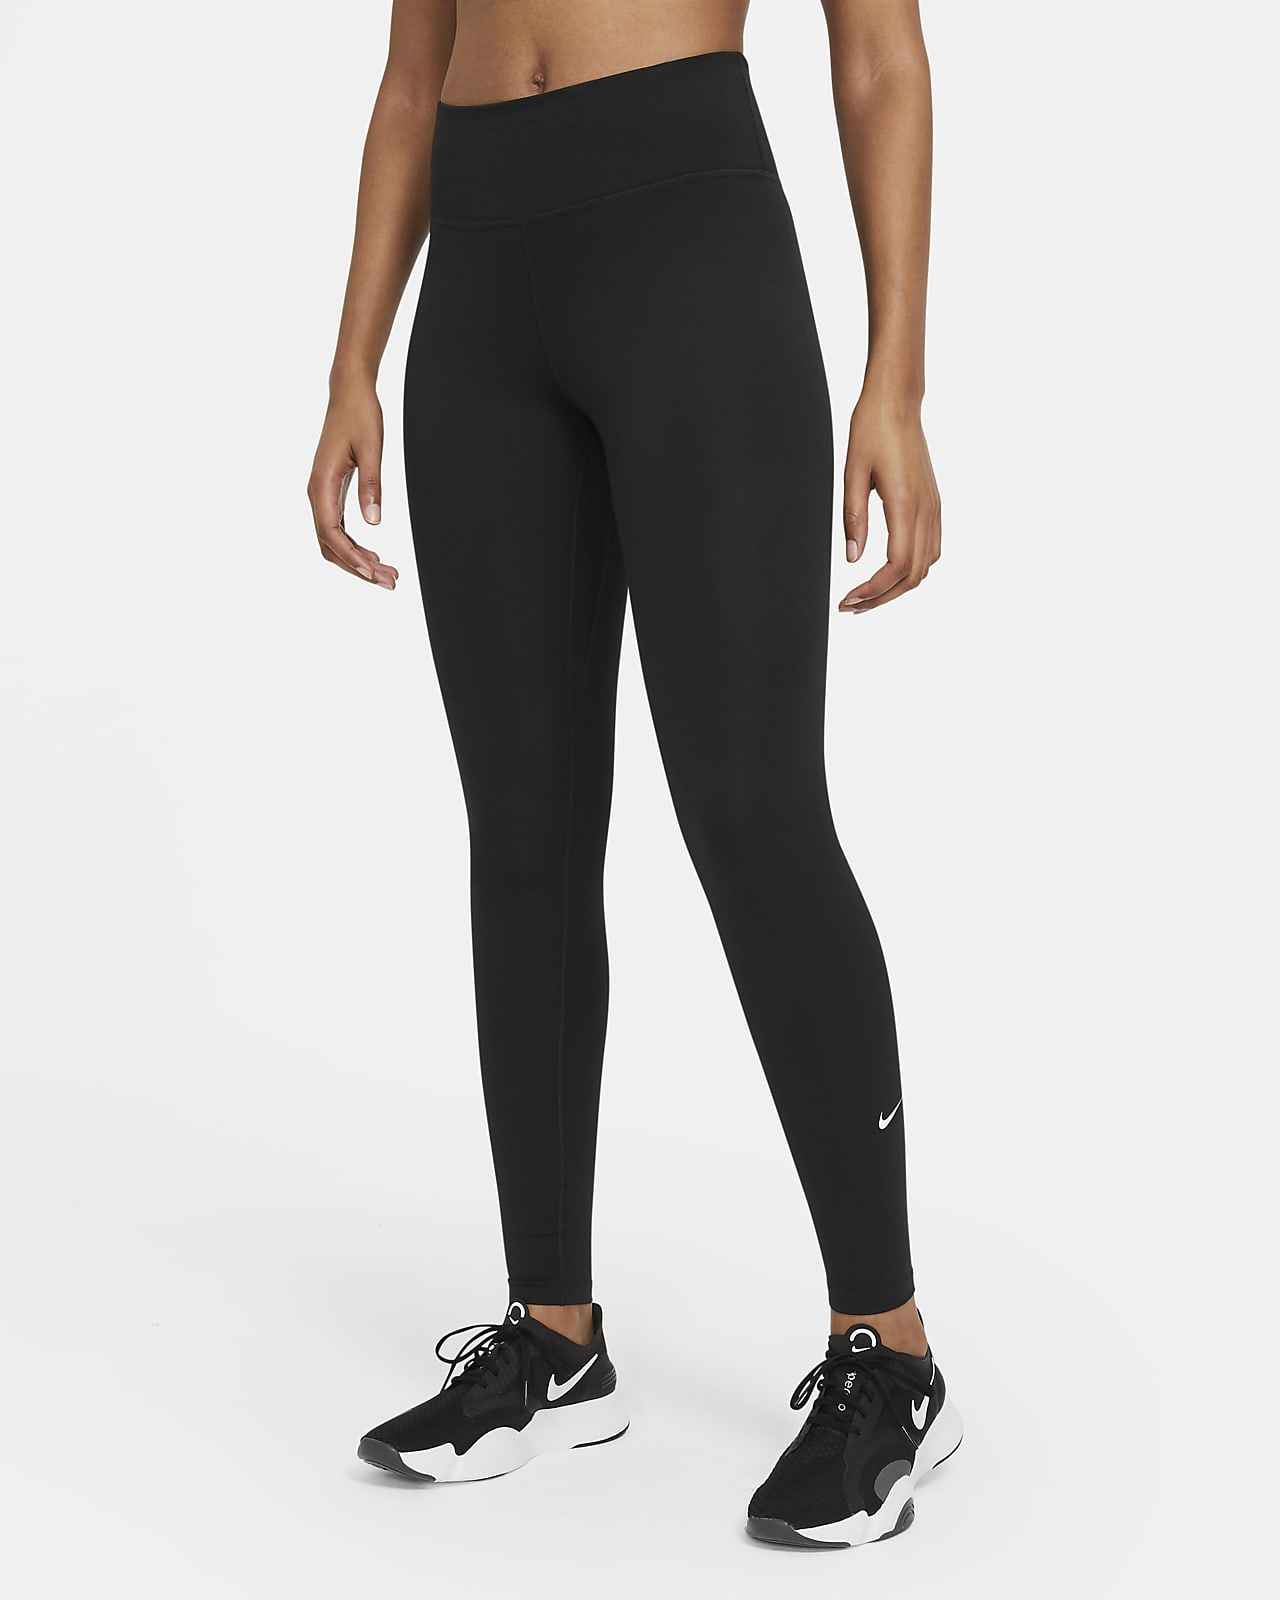 Женские леггинсы со средней посадкой Nike Dri-FIT One